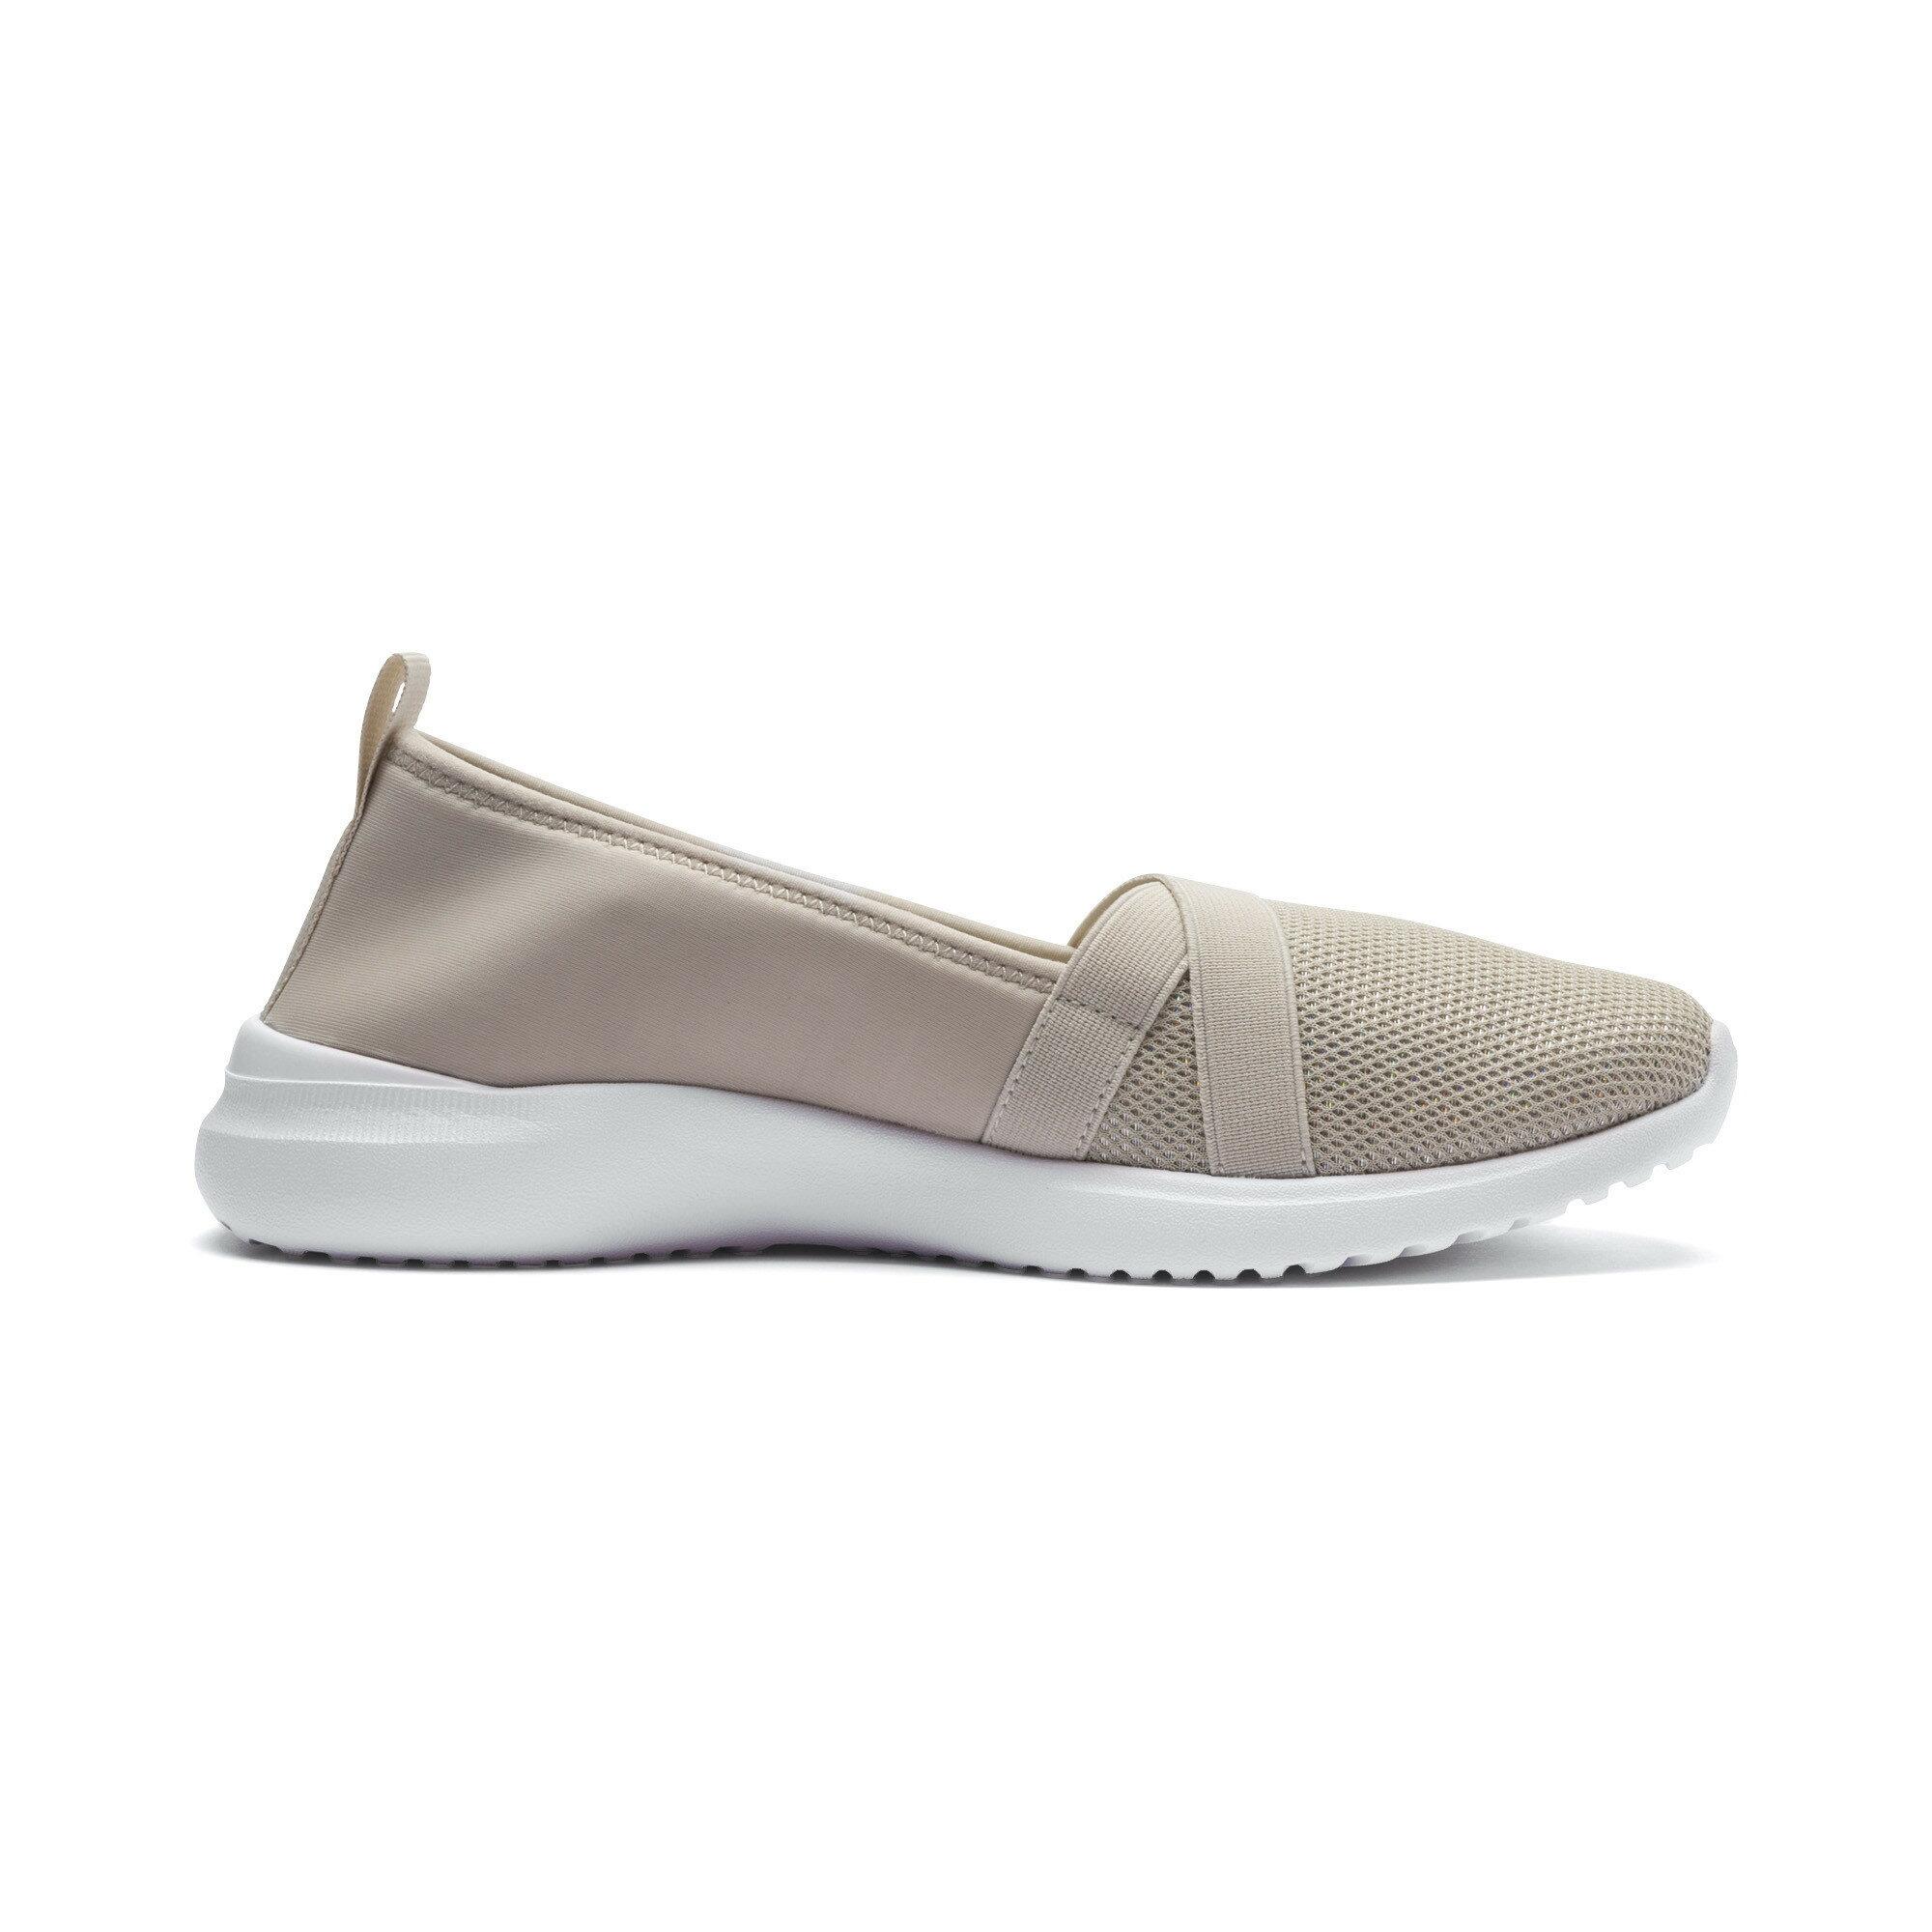 bec477b26435 Official Puma Store  PUMA Adelina Sparkle Women s Ballet Shoes Women ...